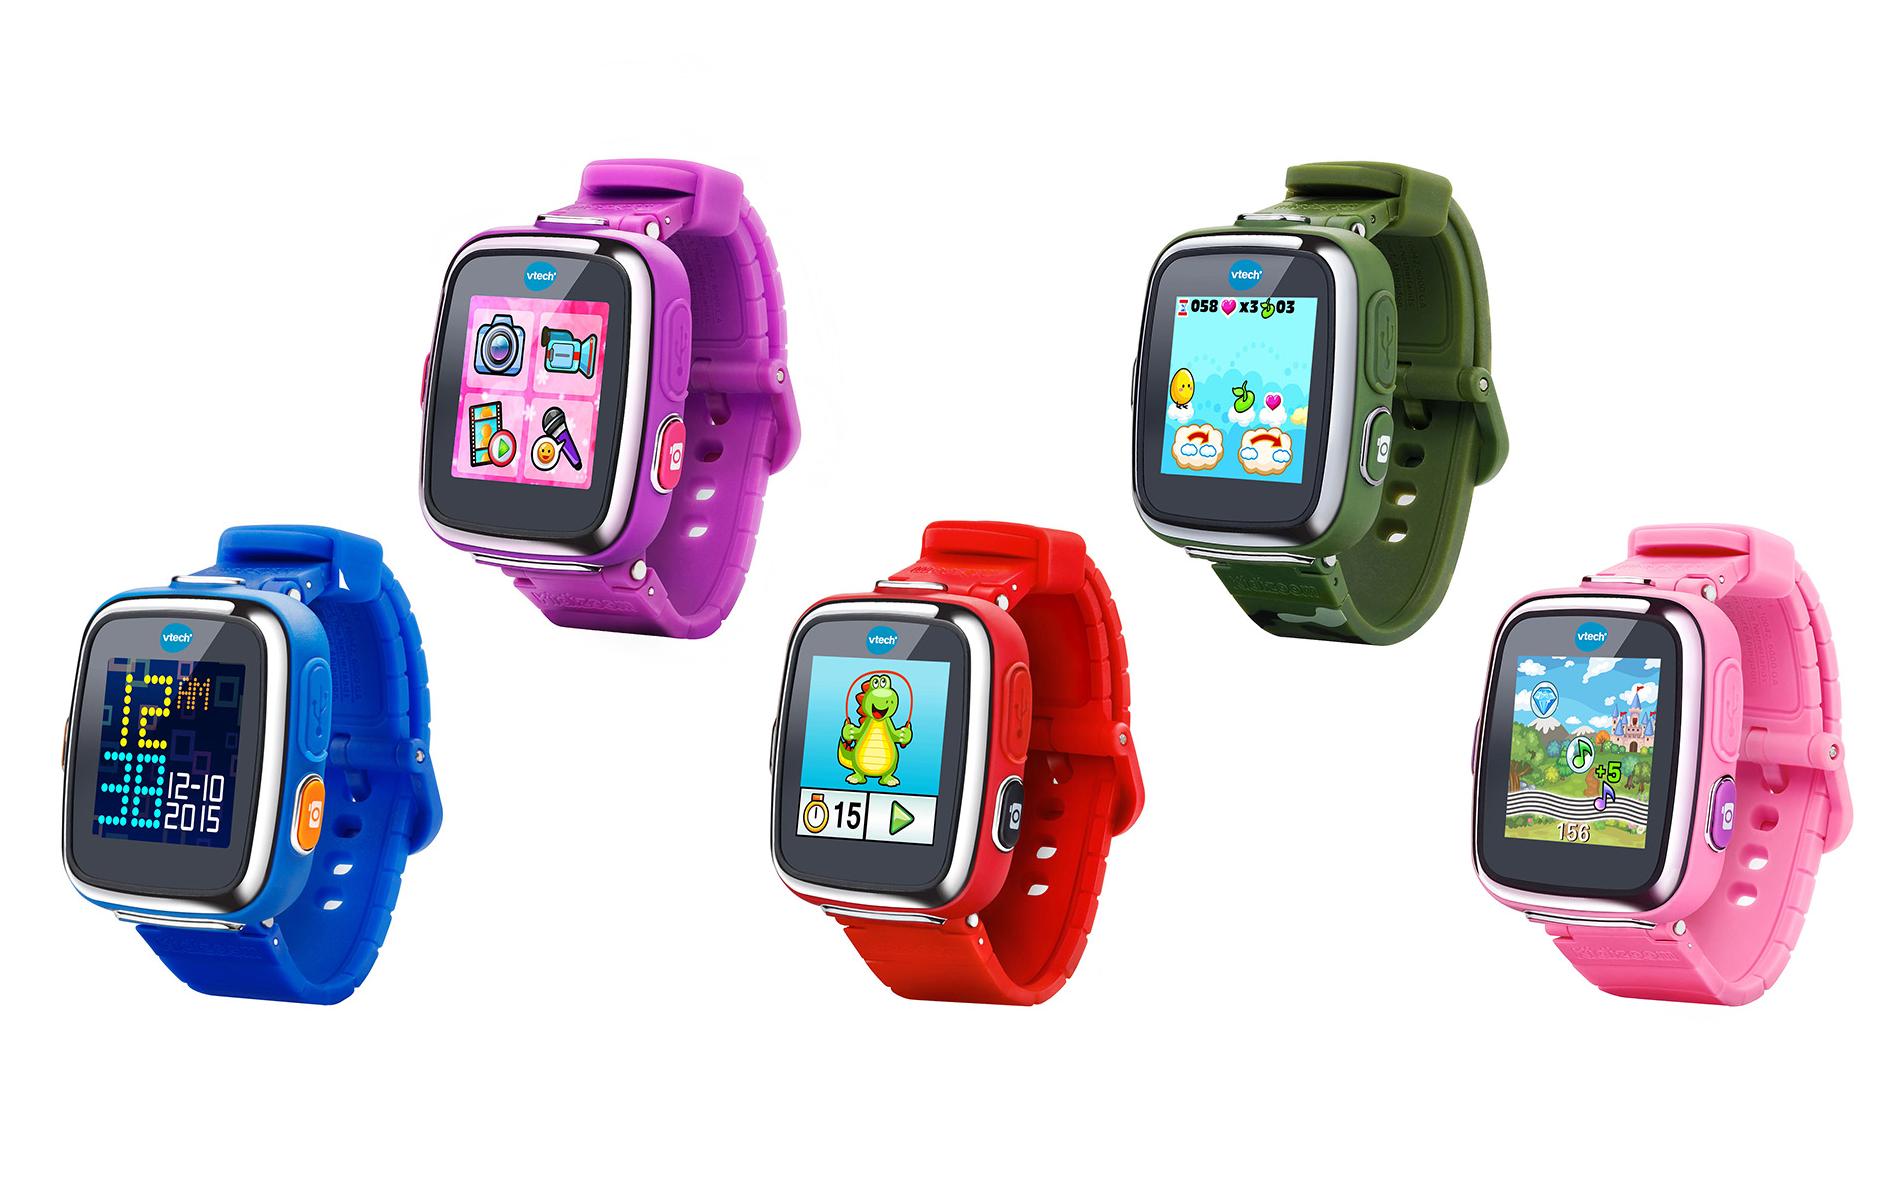 Vtech Kidizoom Smart Watch Plus Review Multi Function